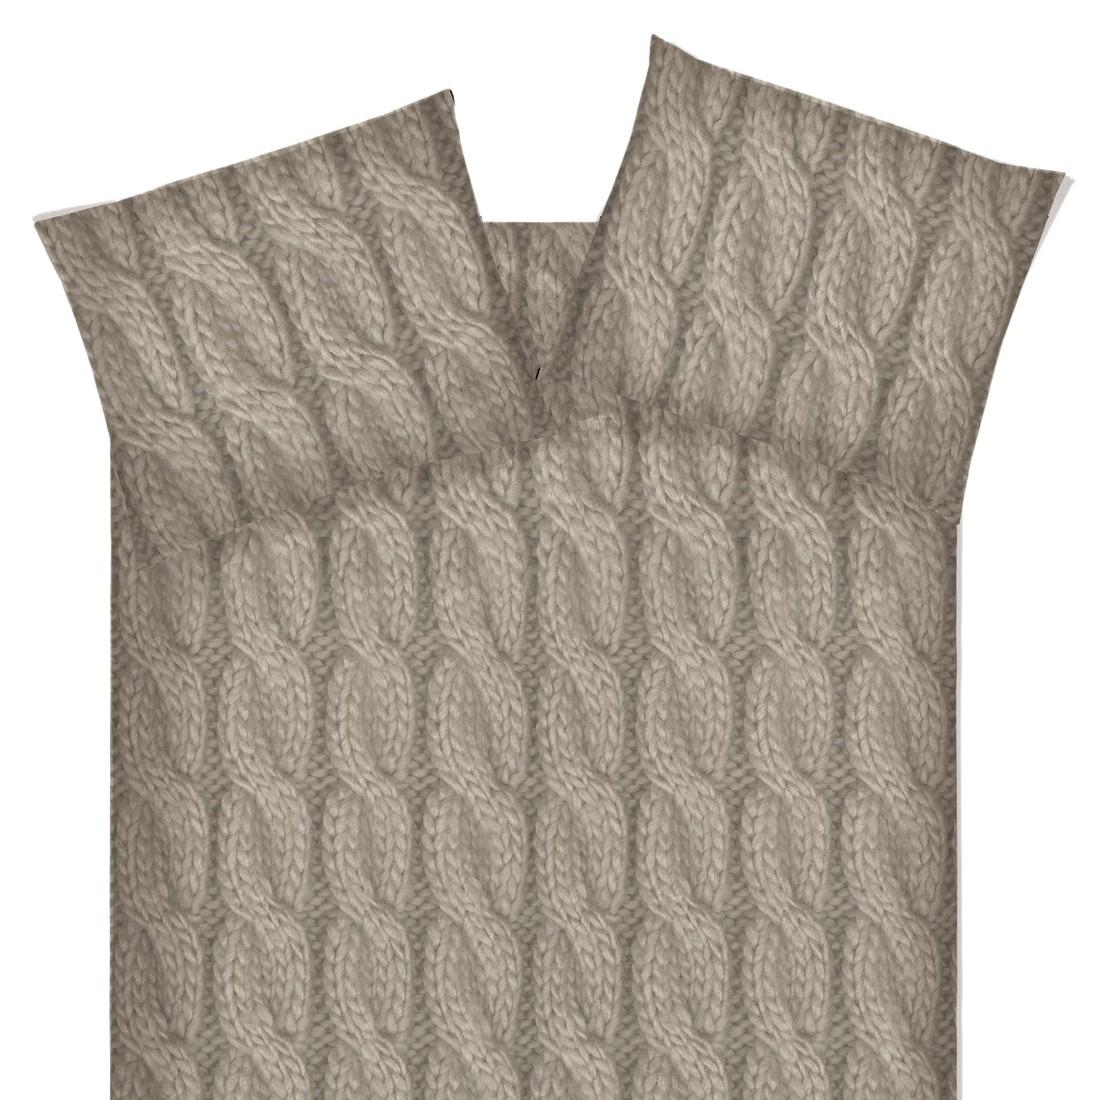 Bettwäsche Ivory Lufness – Flanell – Sand – 135×200, Beddinghouse jetzt bestellen